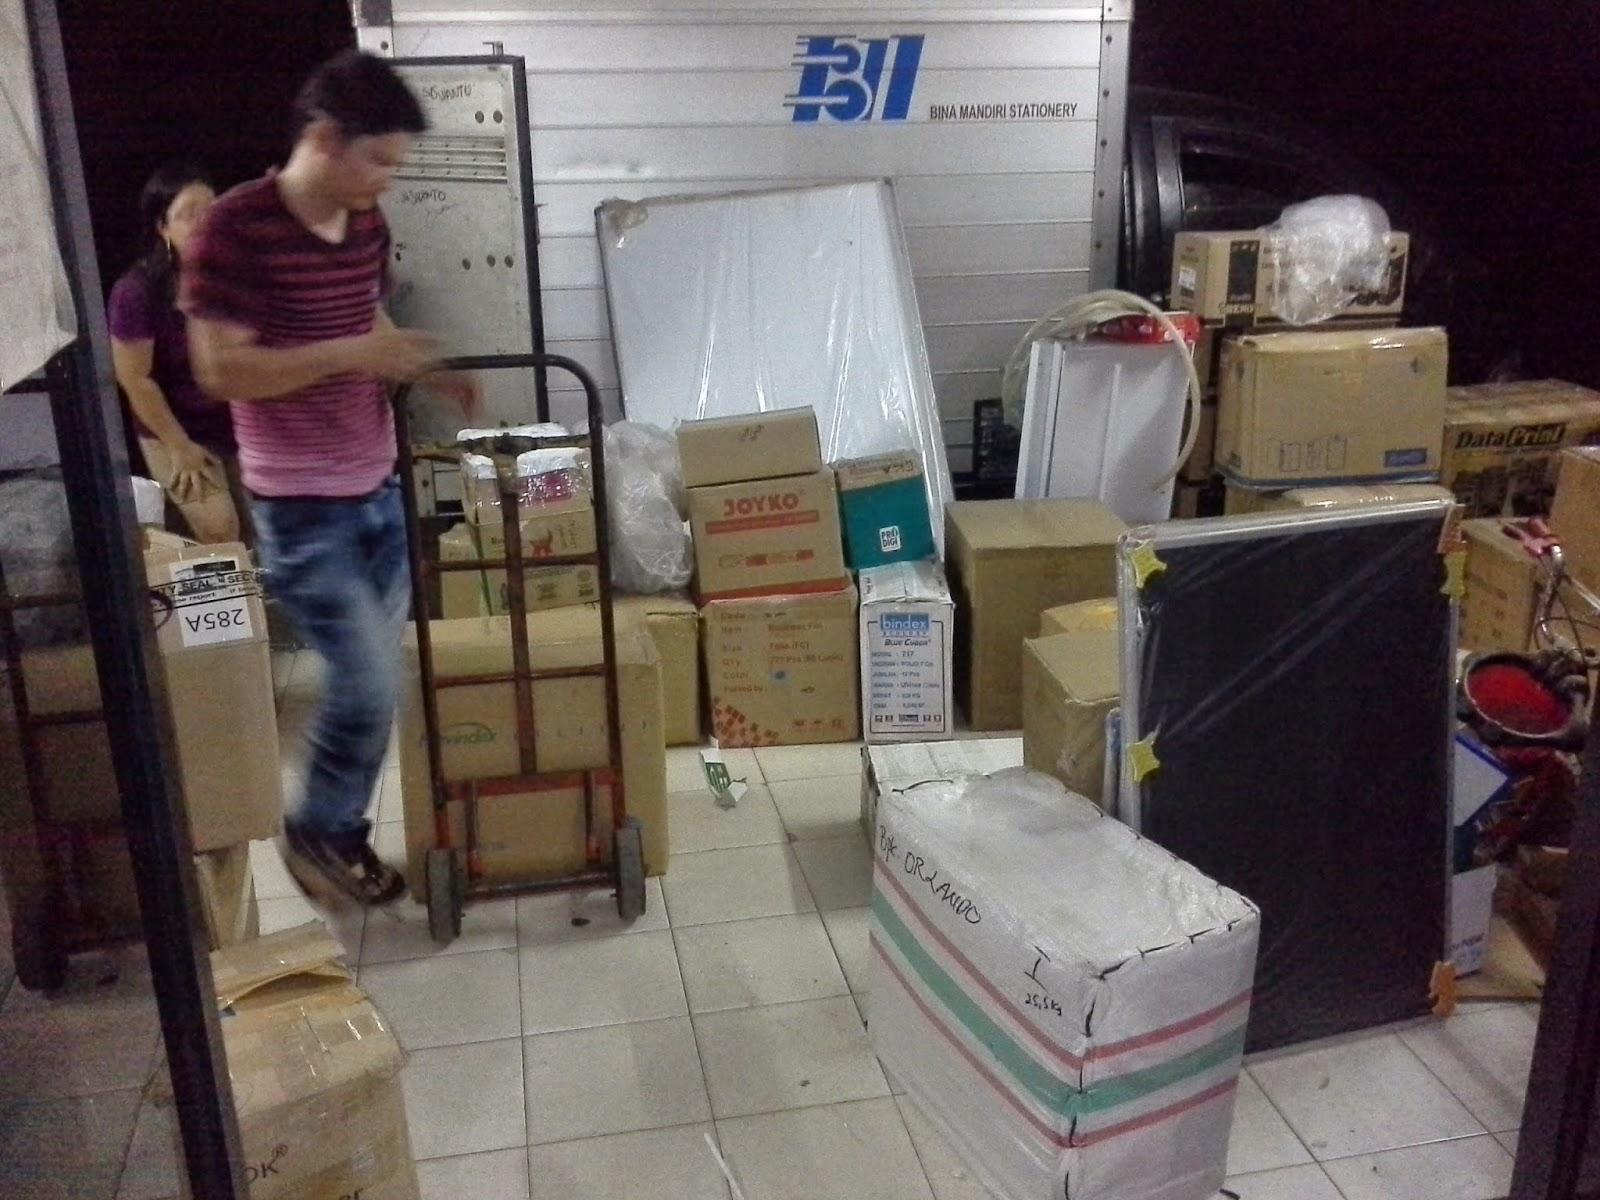 www.hargaalattuliskantor.com  : Cek Kelengkapan pengiriman ATK Stationery